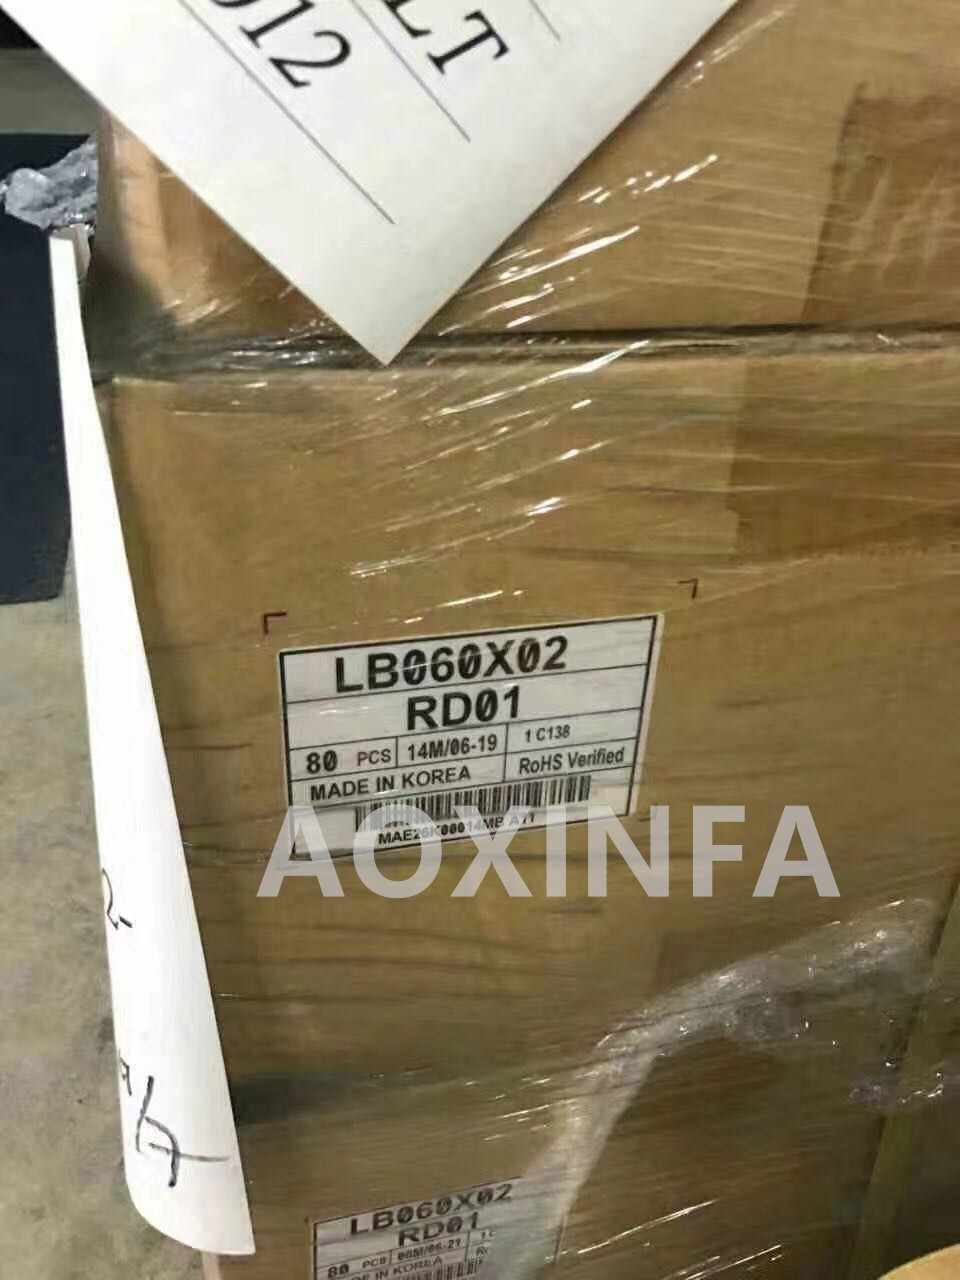 Ferr الشحن الأصلي ل LB060X02-RD01 LB060X01-RD01Ebook قارئ E-الحبر lcd شاشة عرض لوحة ل يريفير قصة HD digma S60